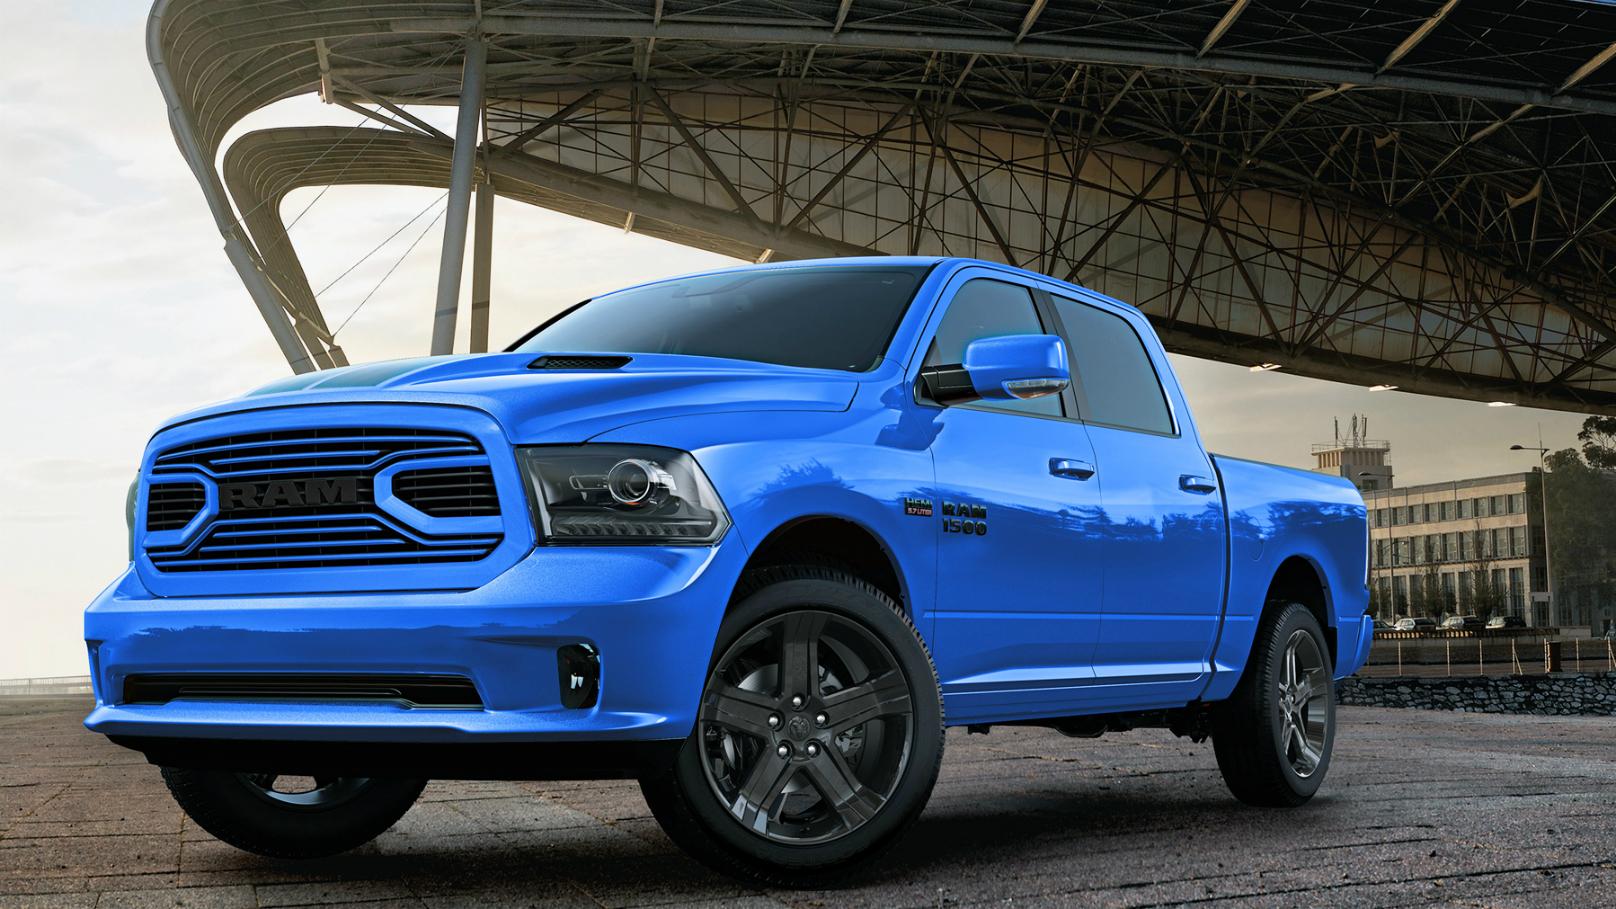 RAM Hydro Blue Sport